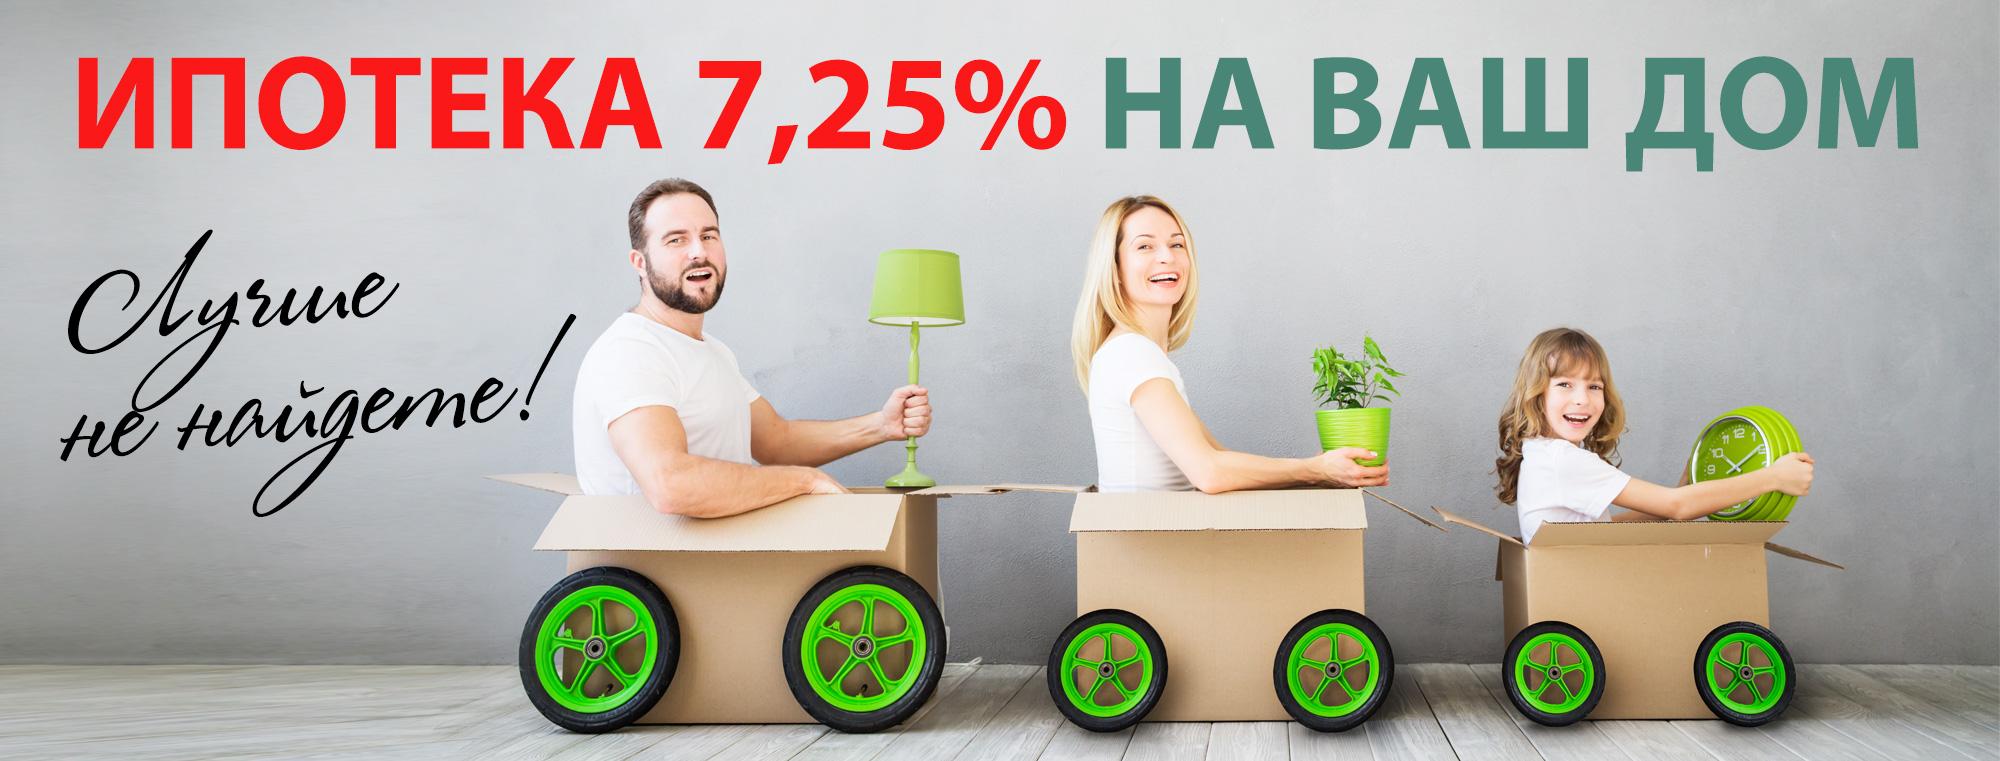 ИПОТЕКА 7,25% на ваш дом! Лучше не найдете!